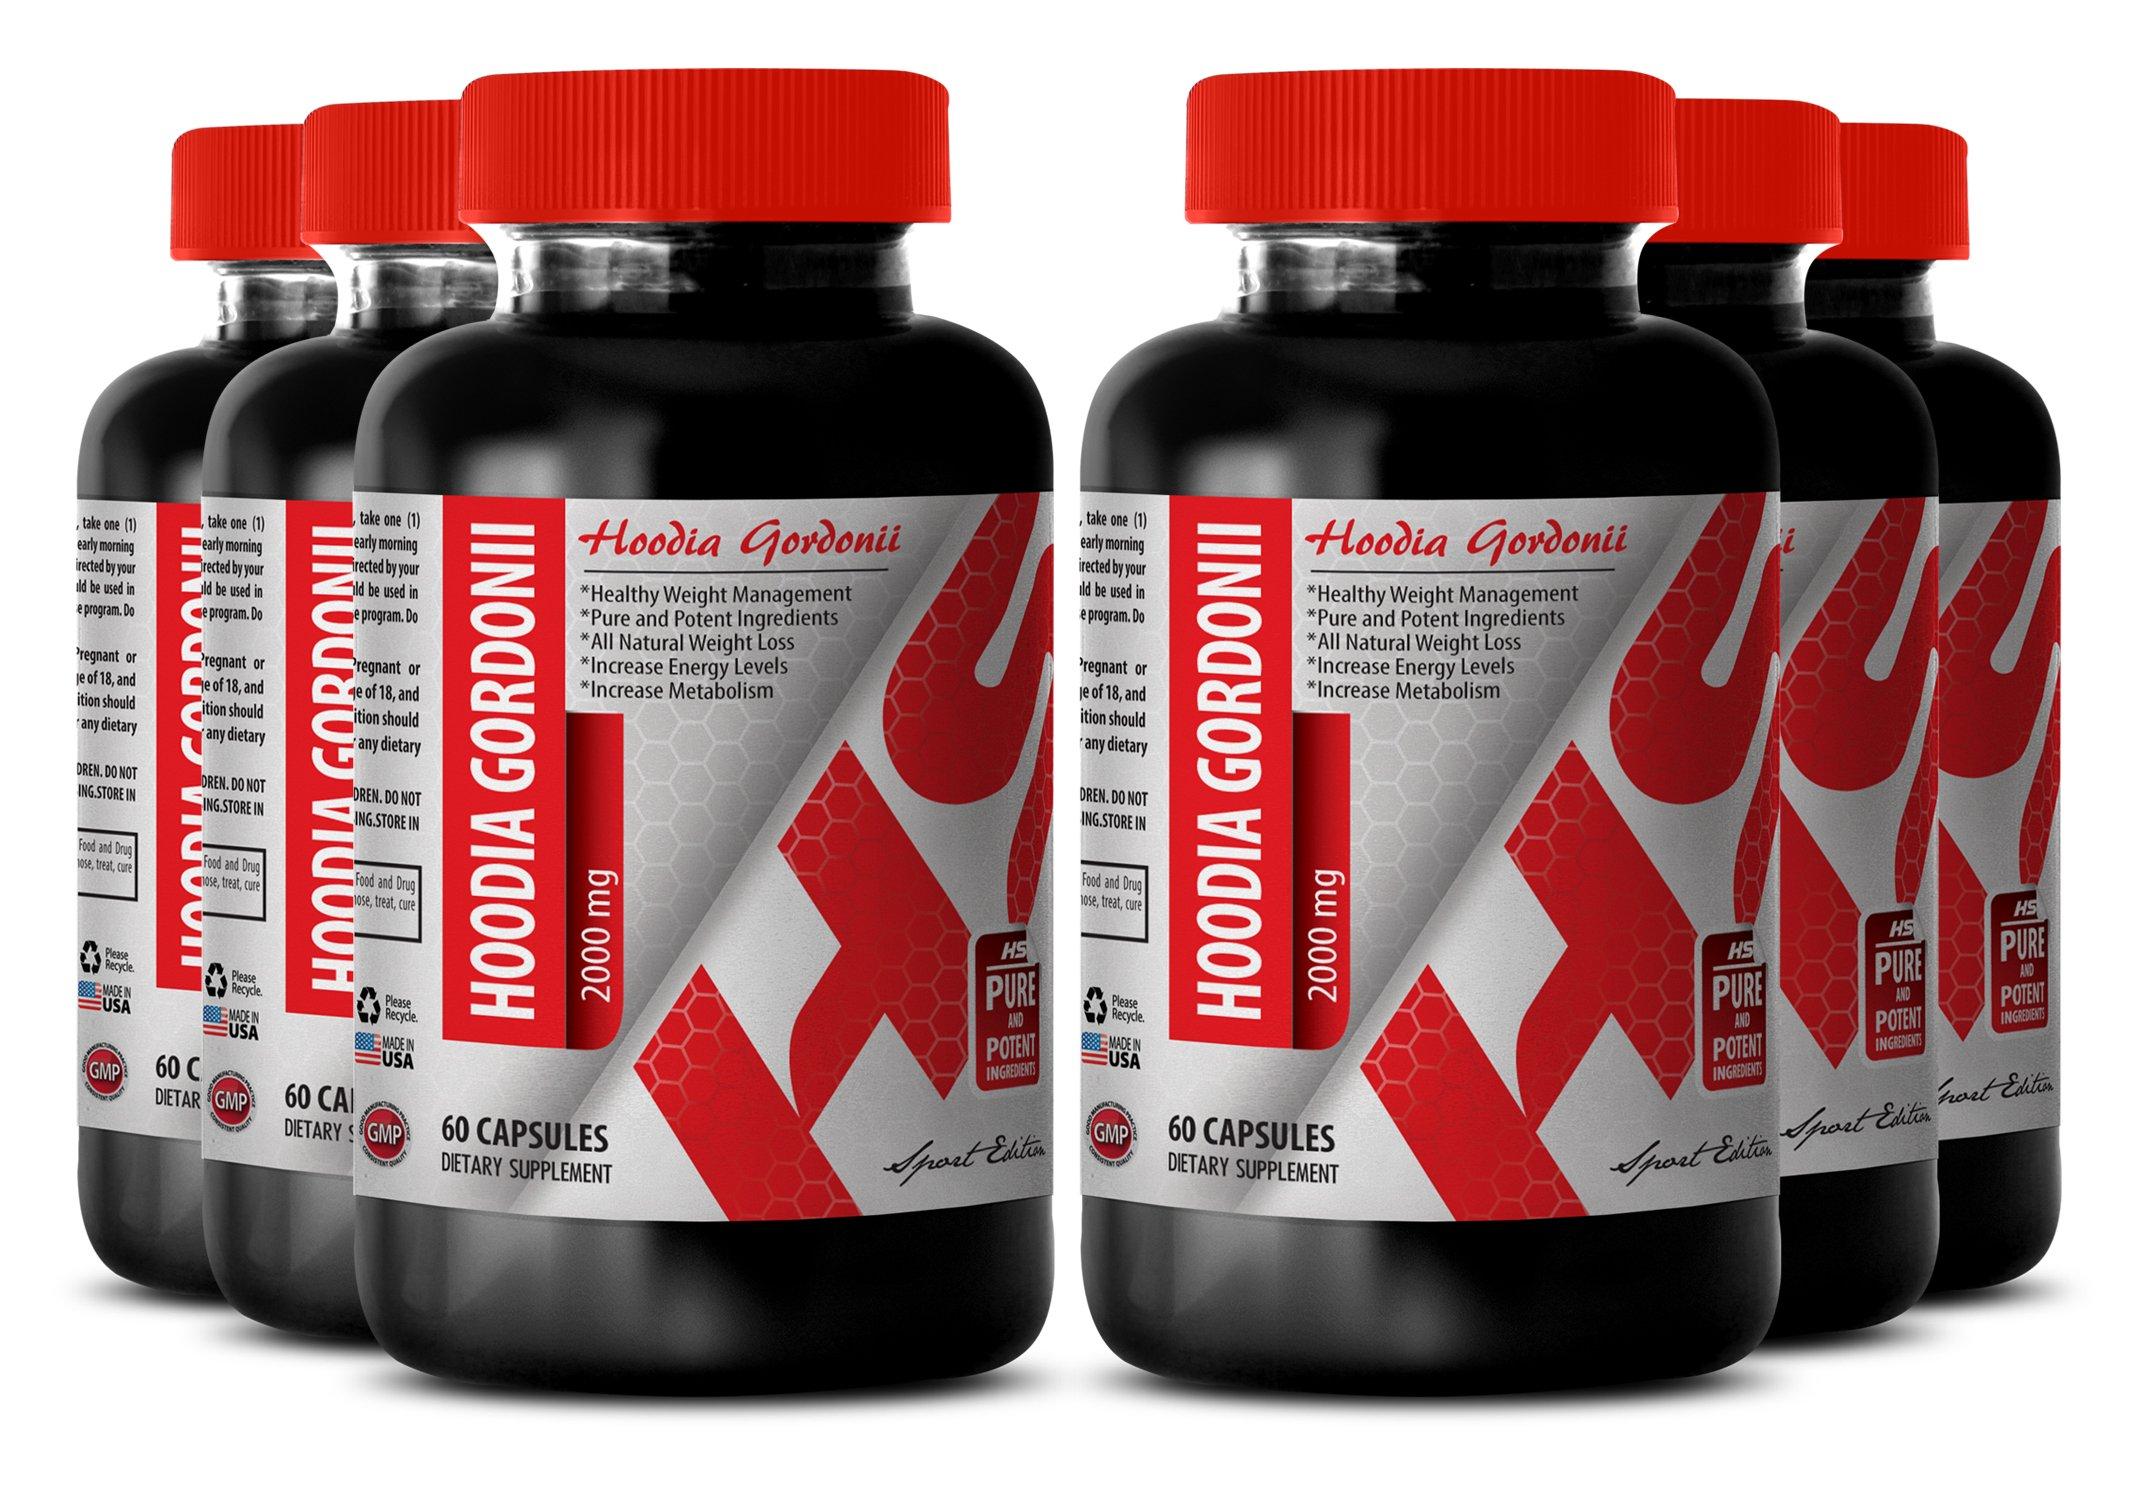 Hoodia organic - HOODIA GORDONII POWDER 2000 MG - weight loss supplement (6 Bottles)